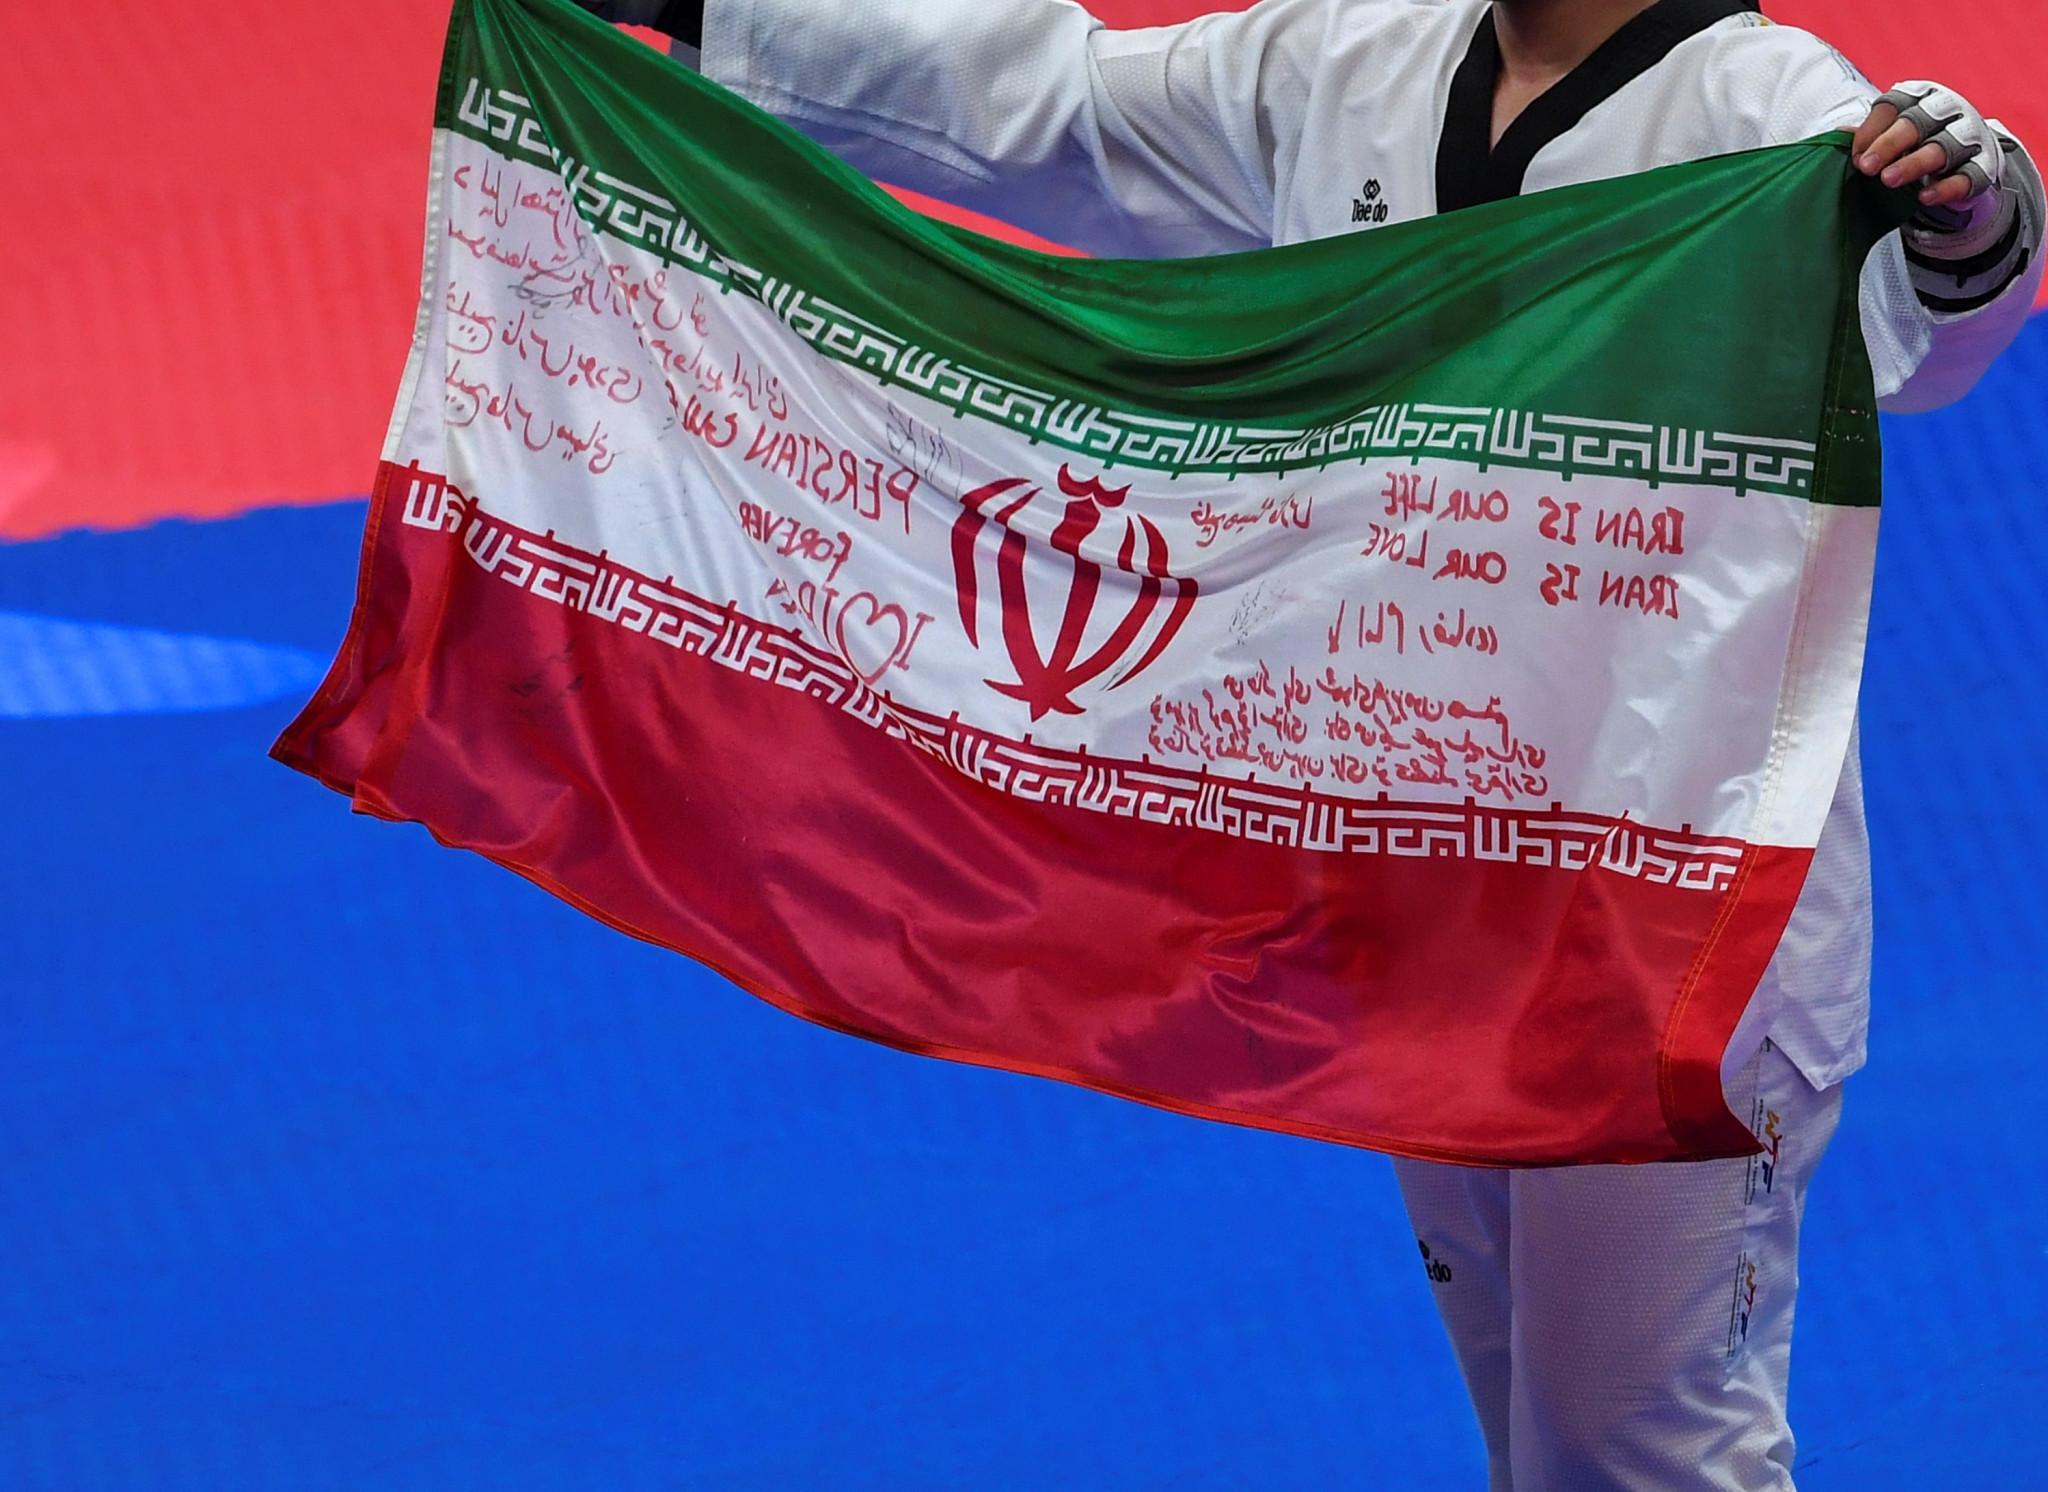 Fariborz Asgari has been retained as Iran's national taekwondo coach ©Getty Images